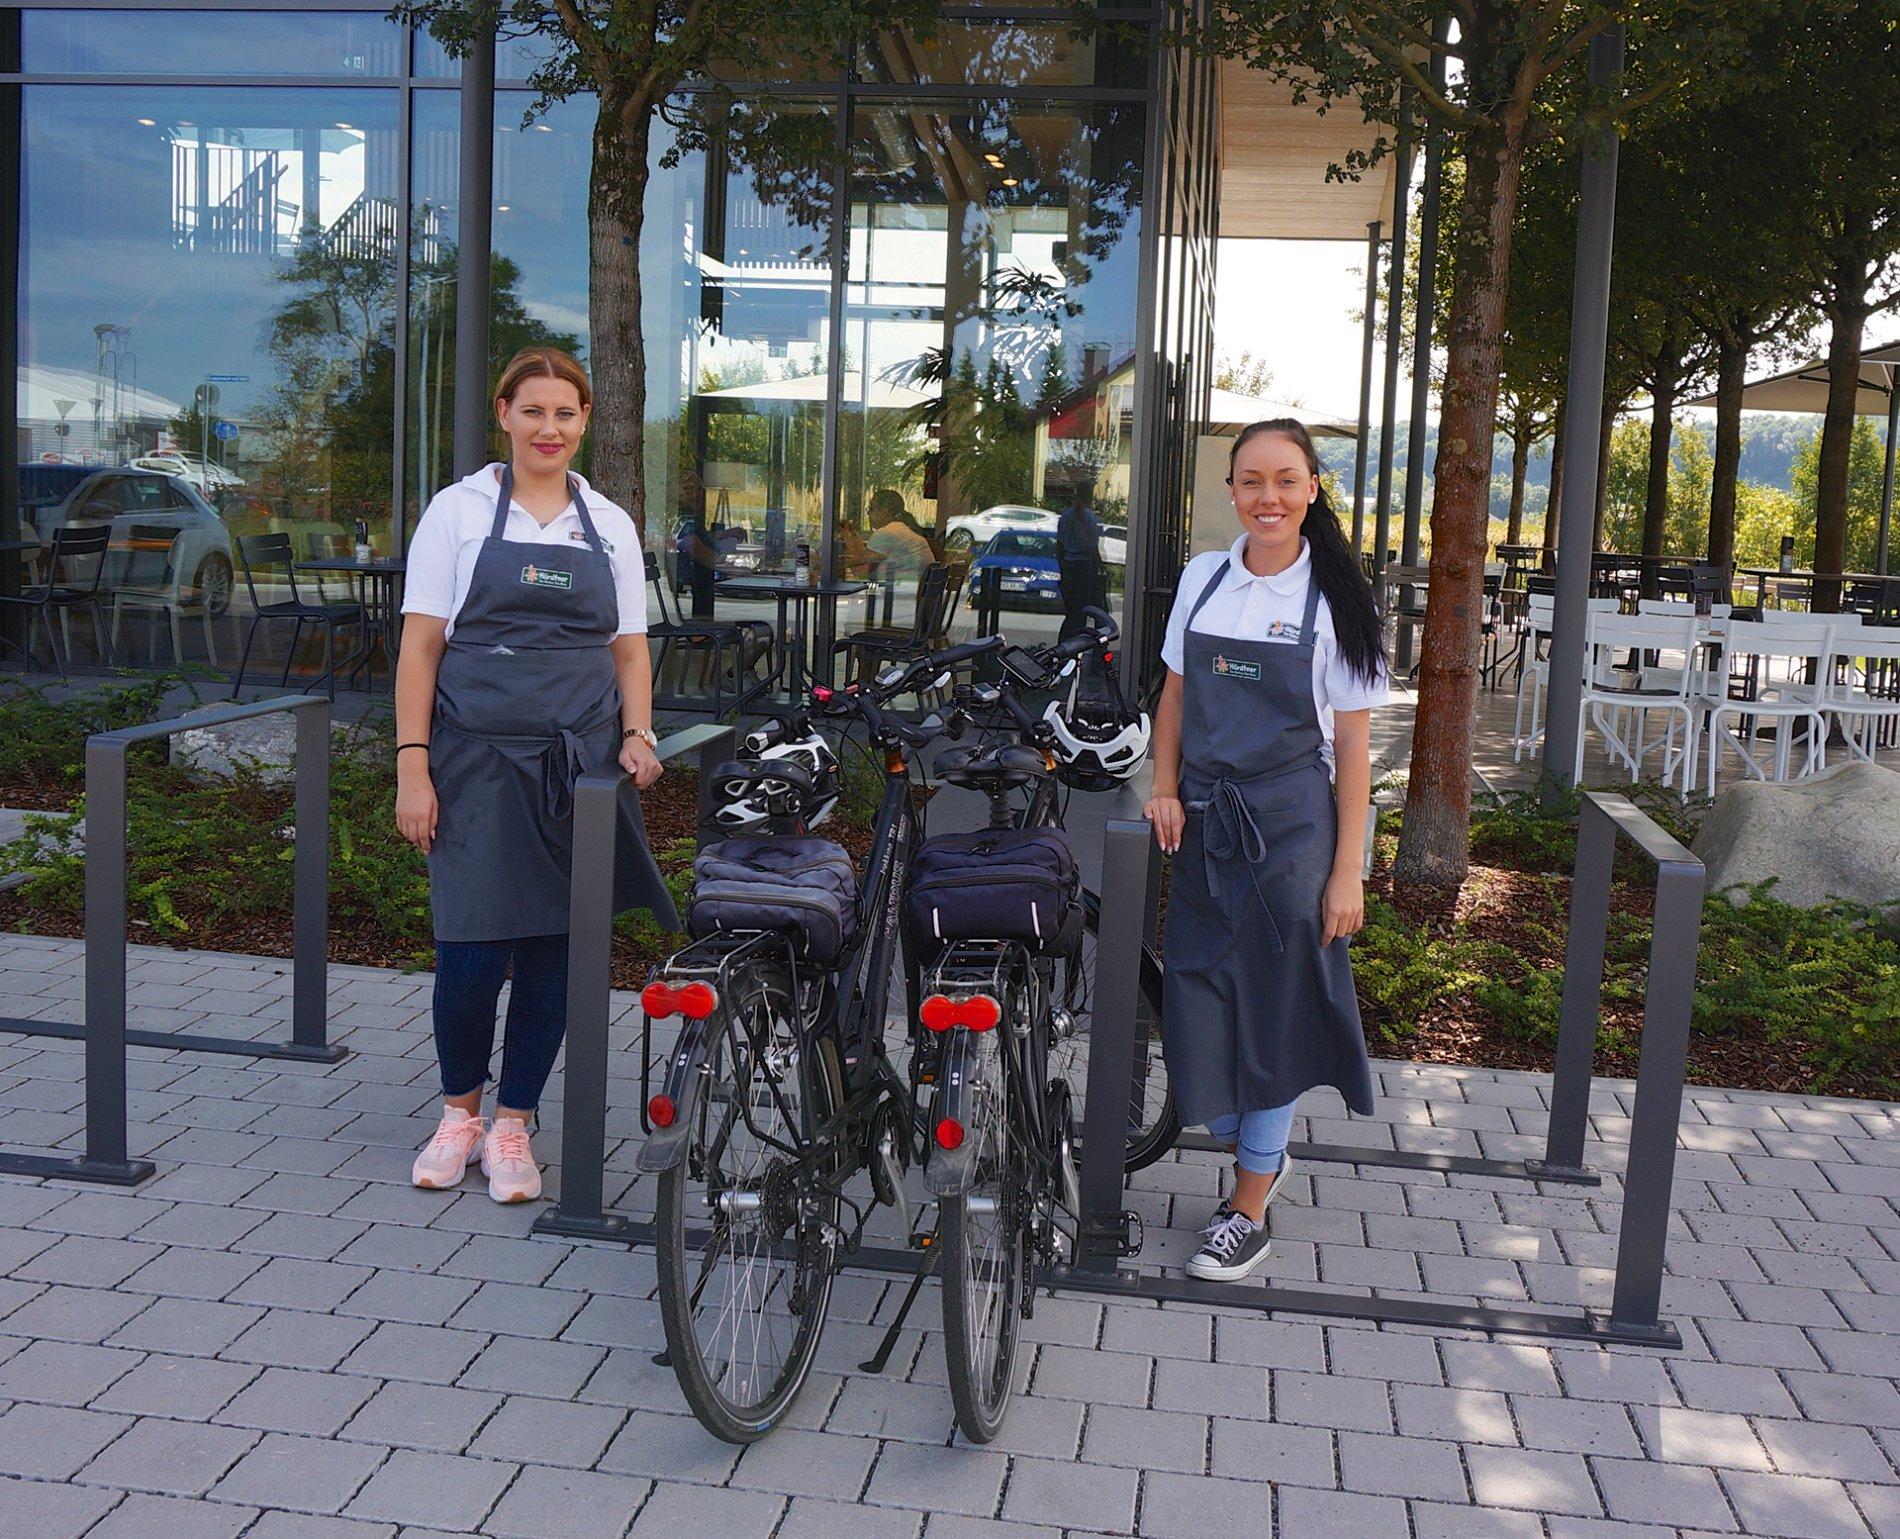 E-Bike-Ladestation Bäckereicafé Härdtner Offenau | HeilbronnerLand